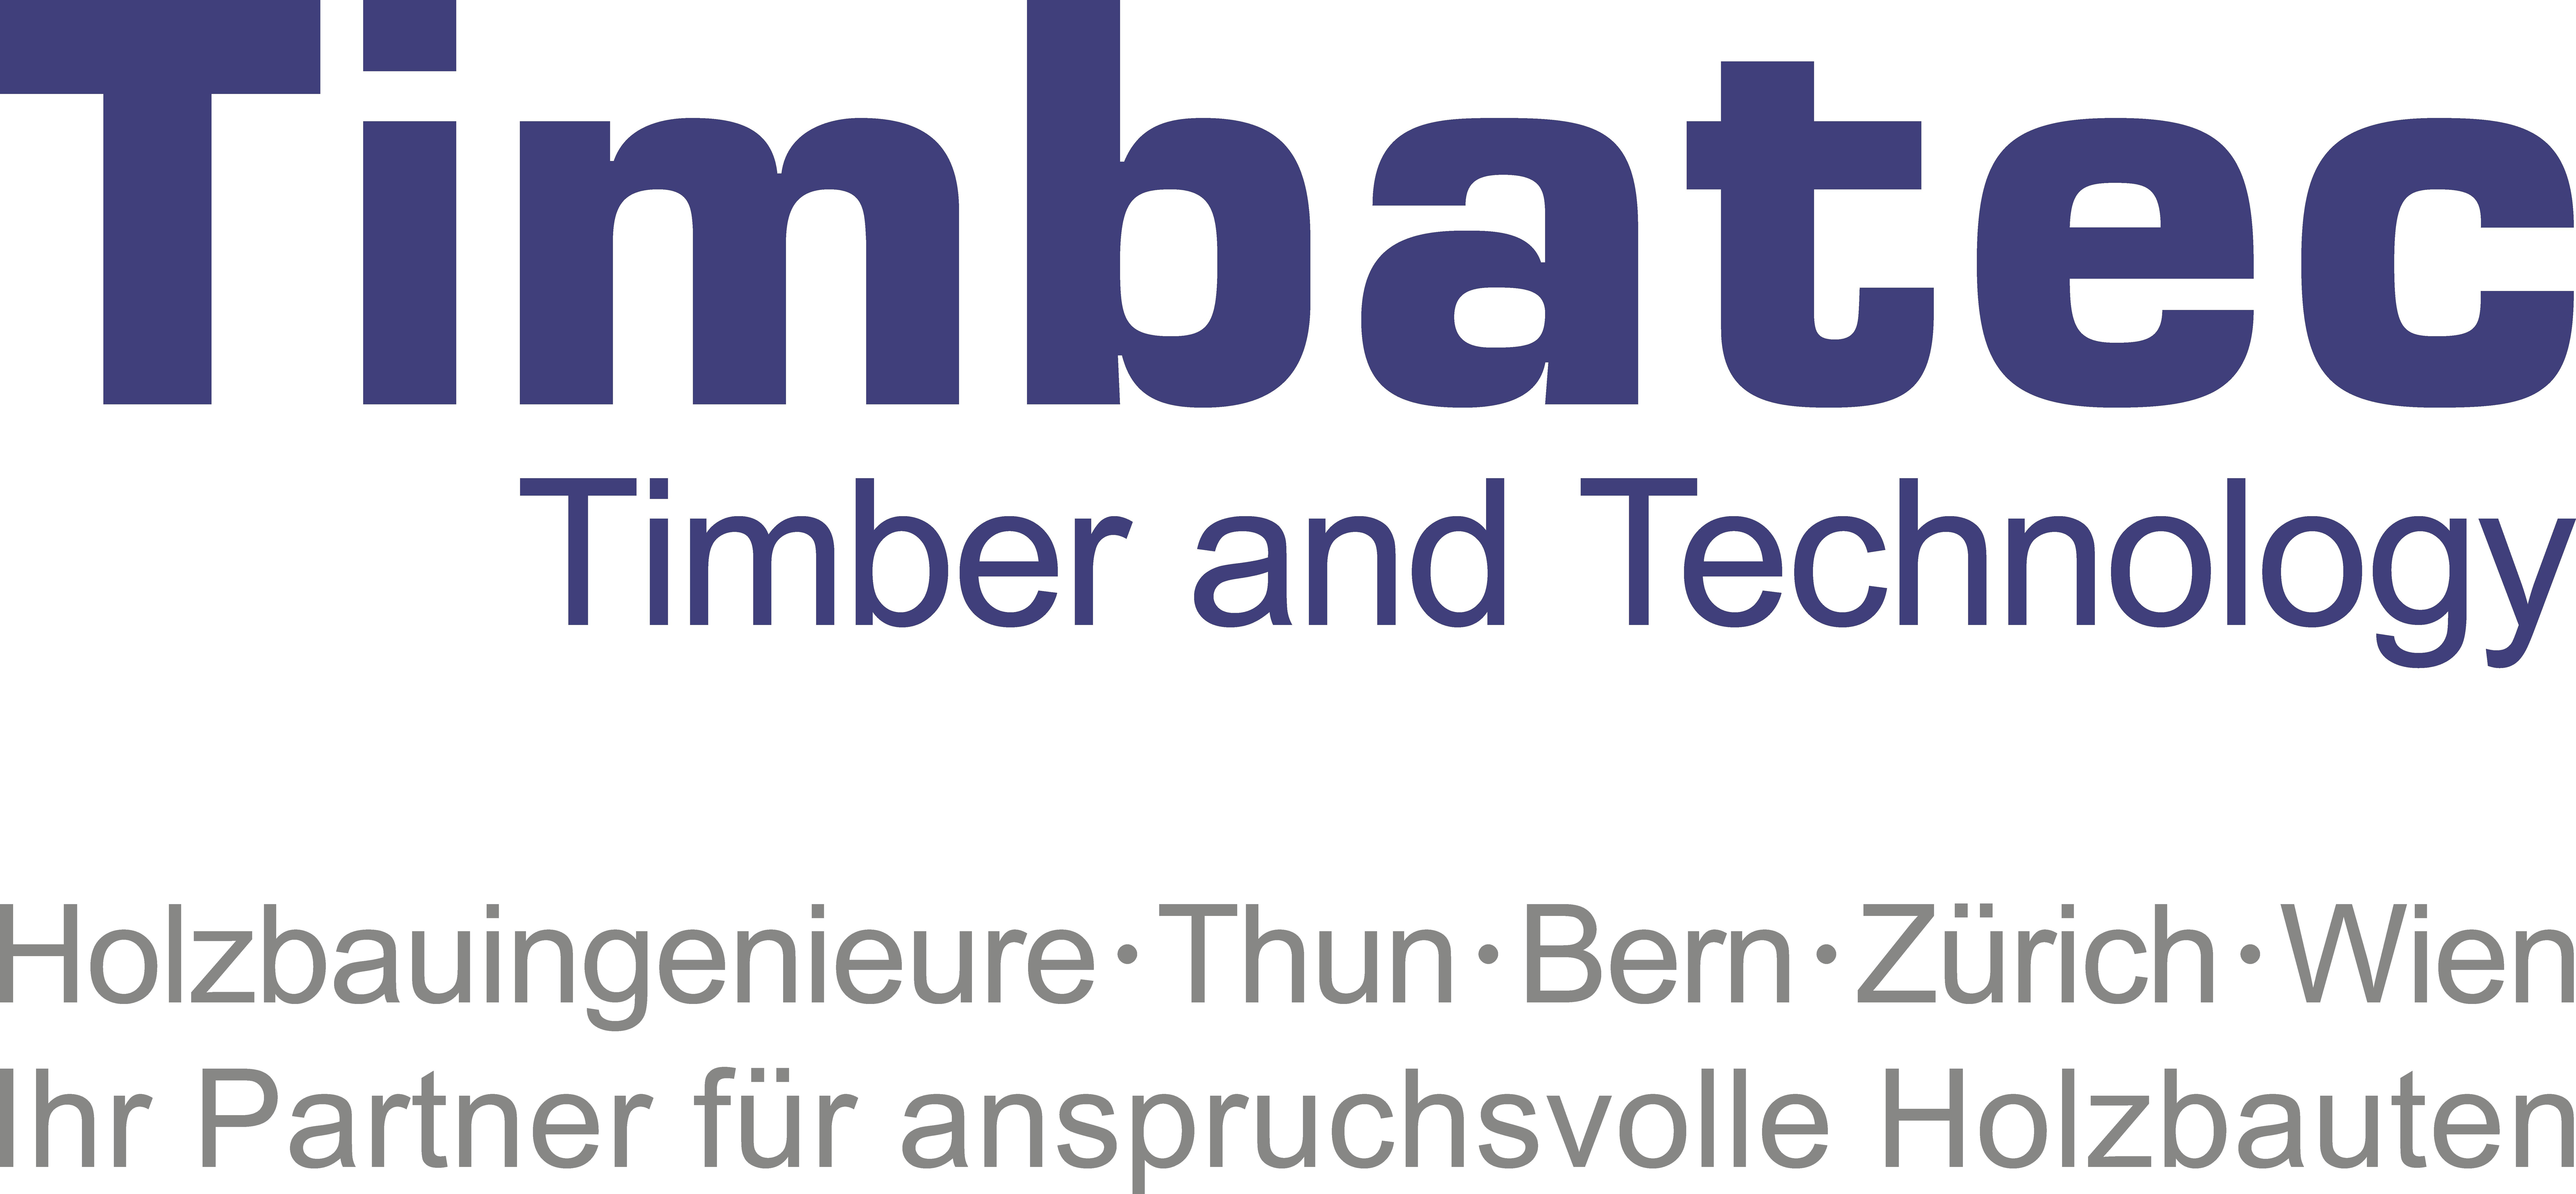 Timbatec_TimberAndTechnology_Zusatz_cmyk_300dpi